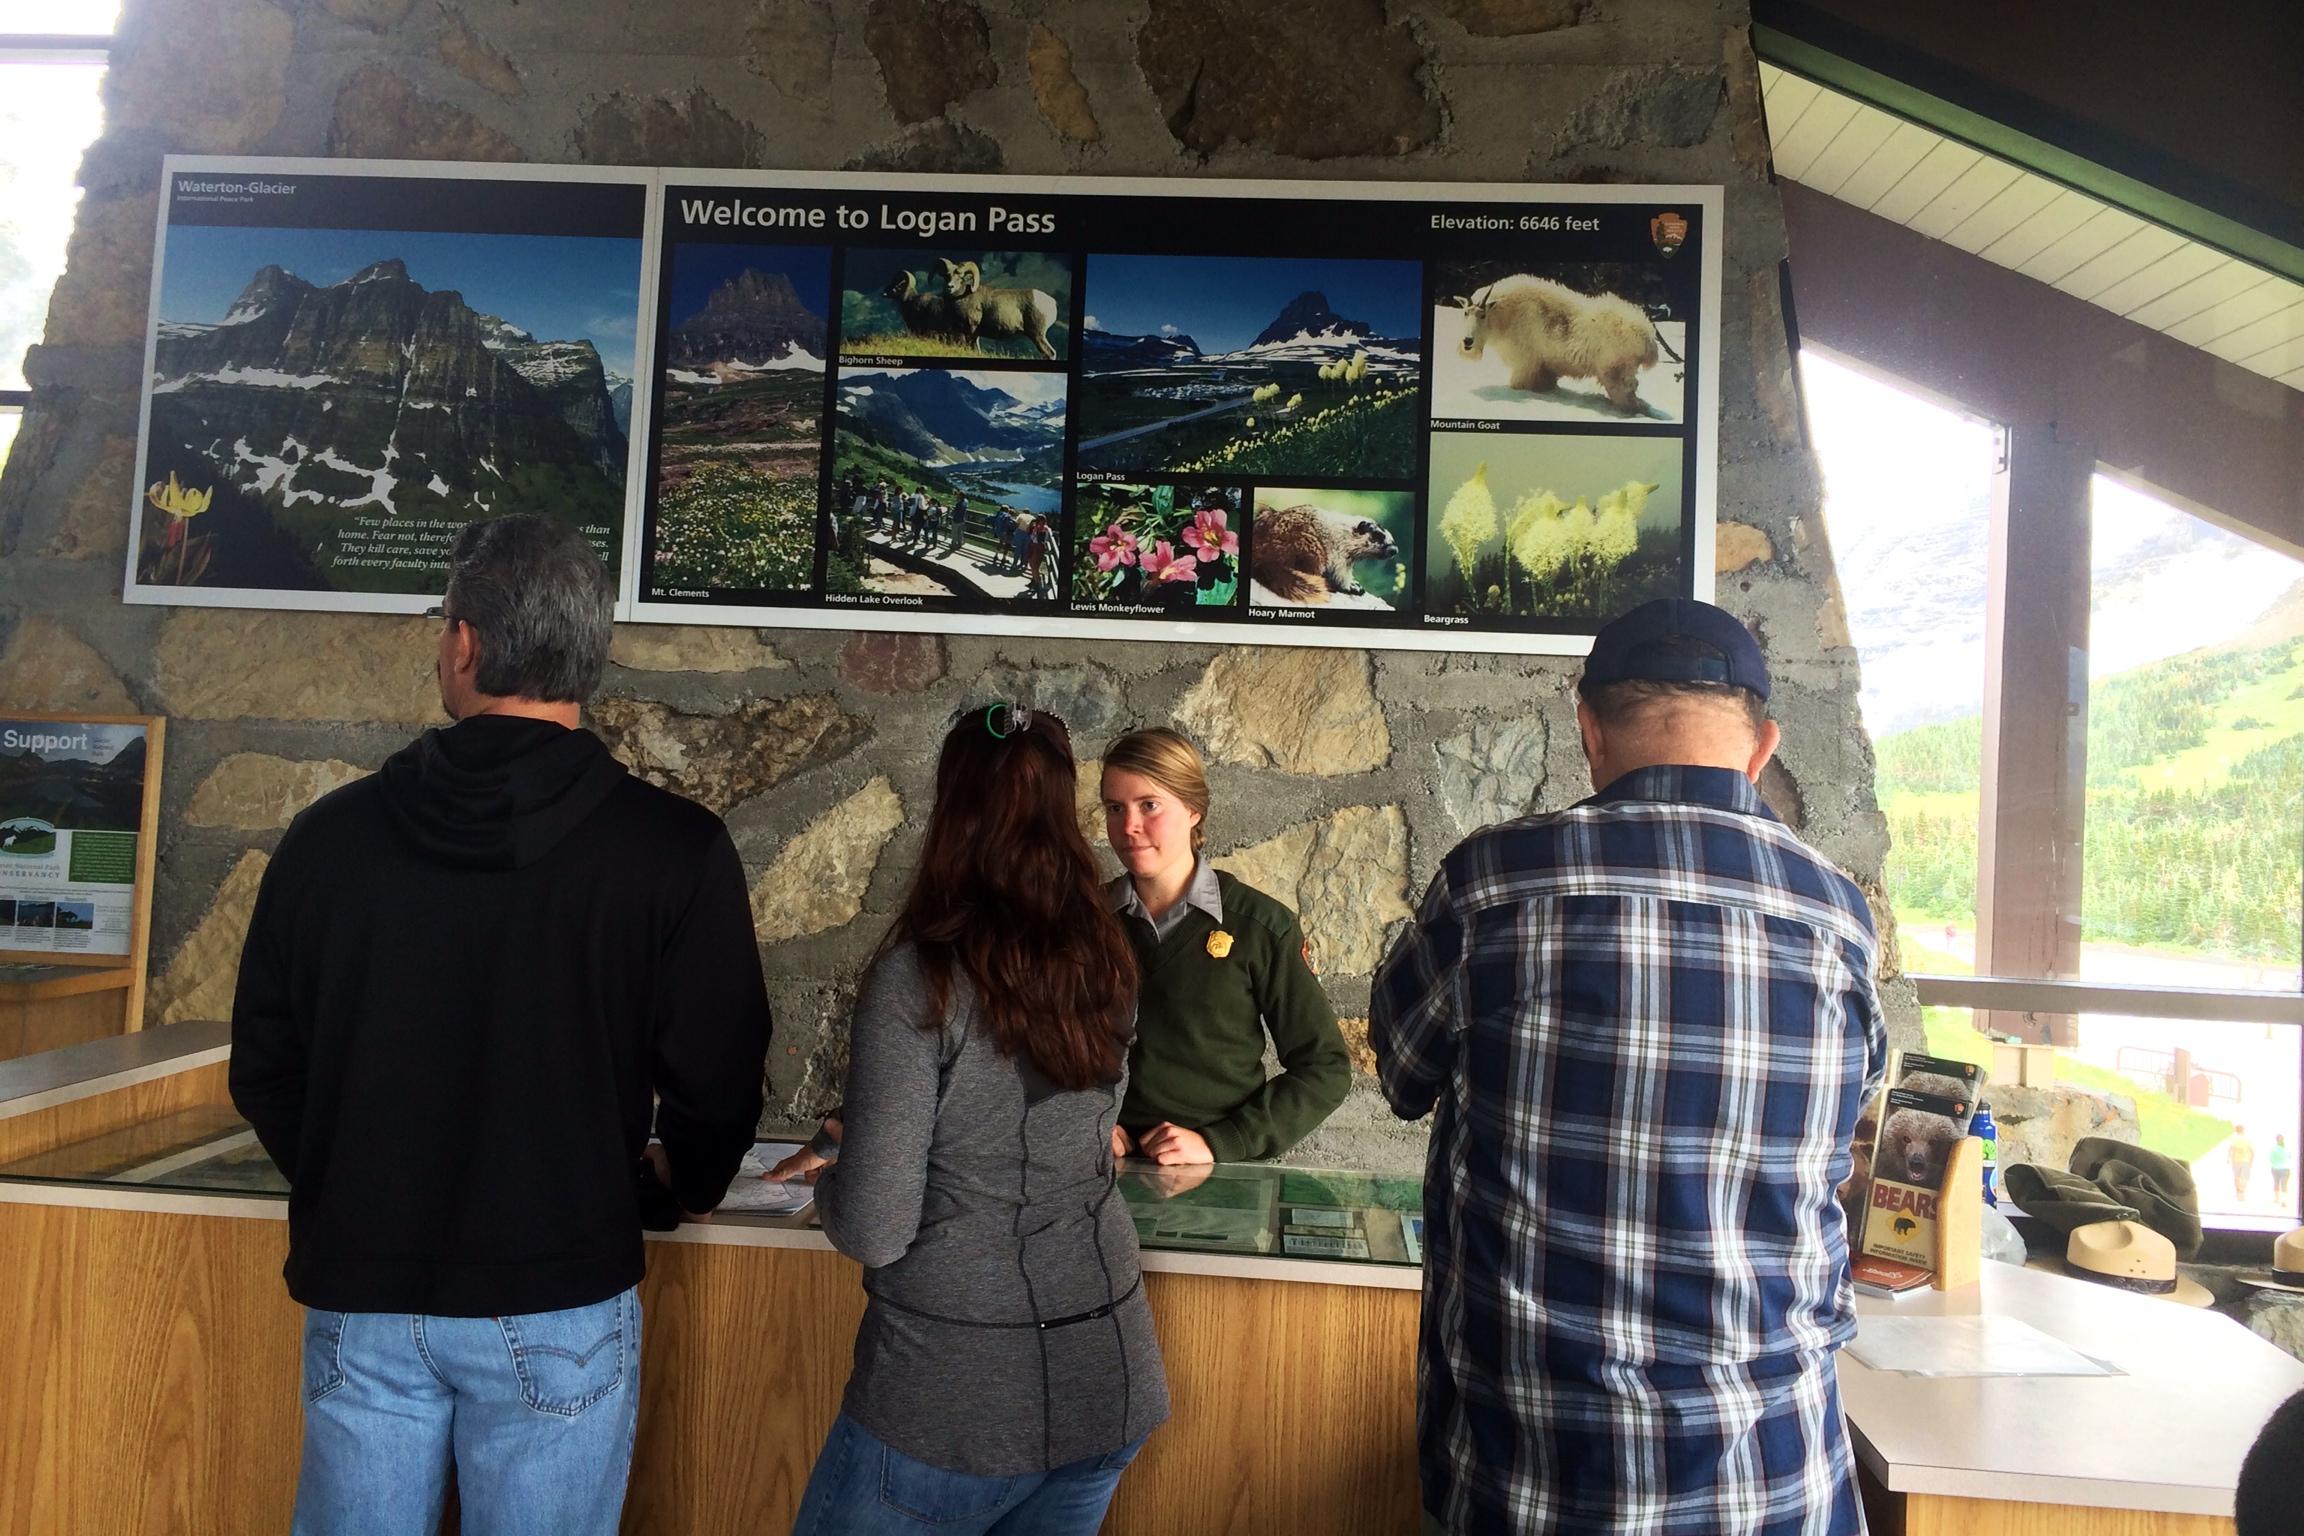 Logan Pass Visitors Center